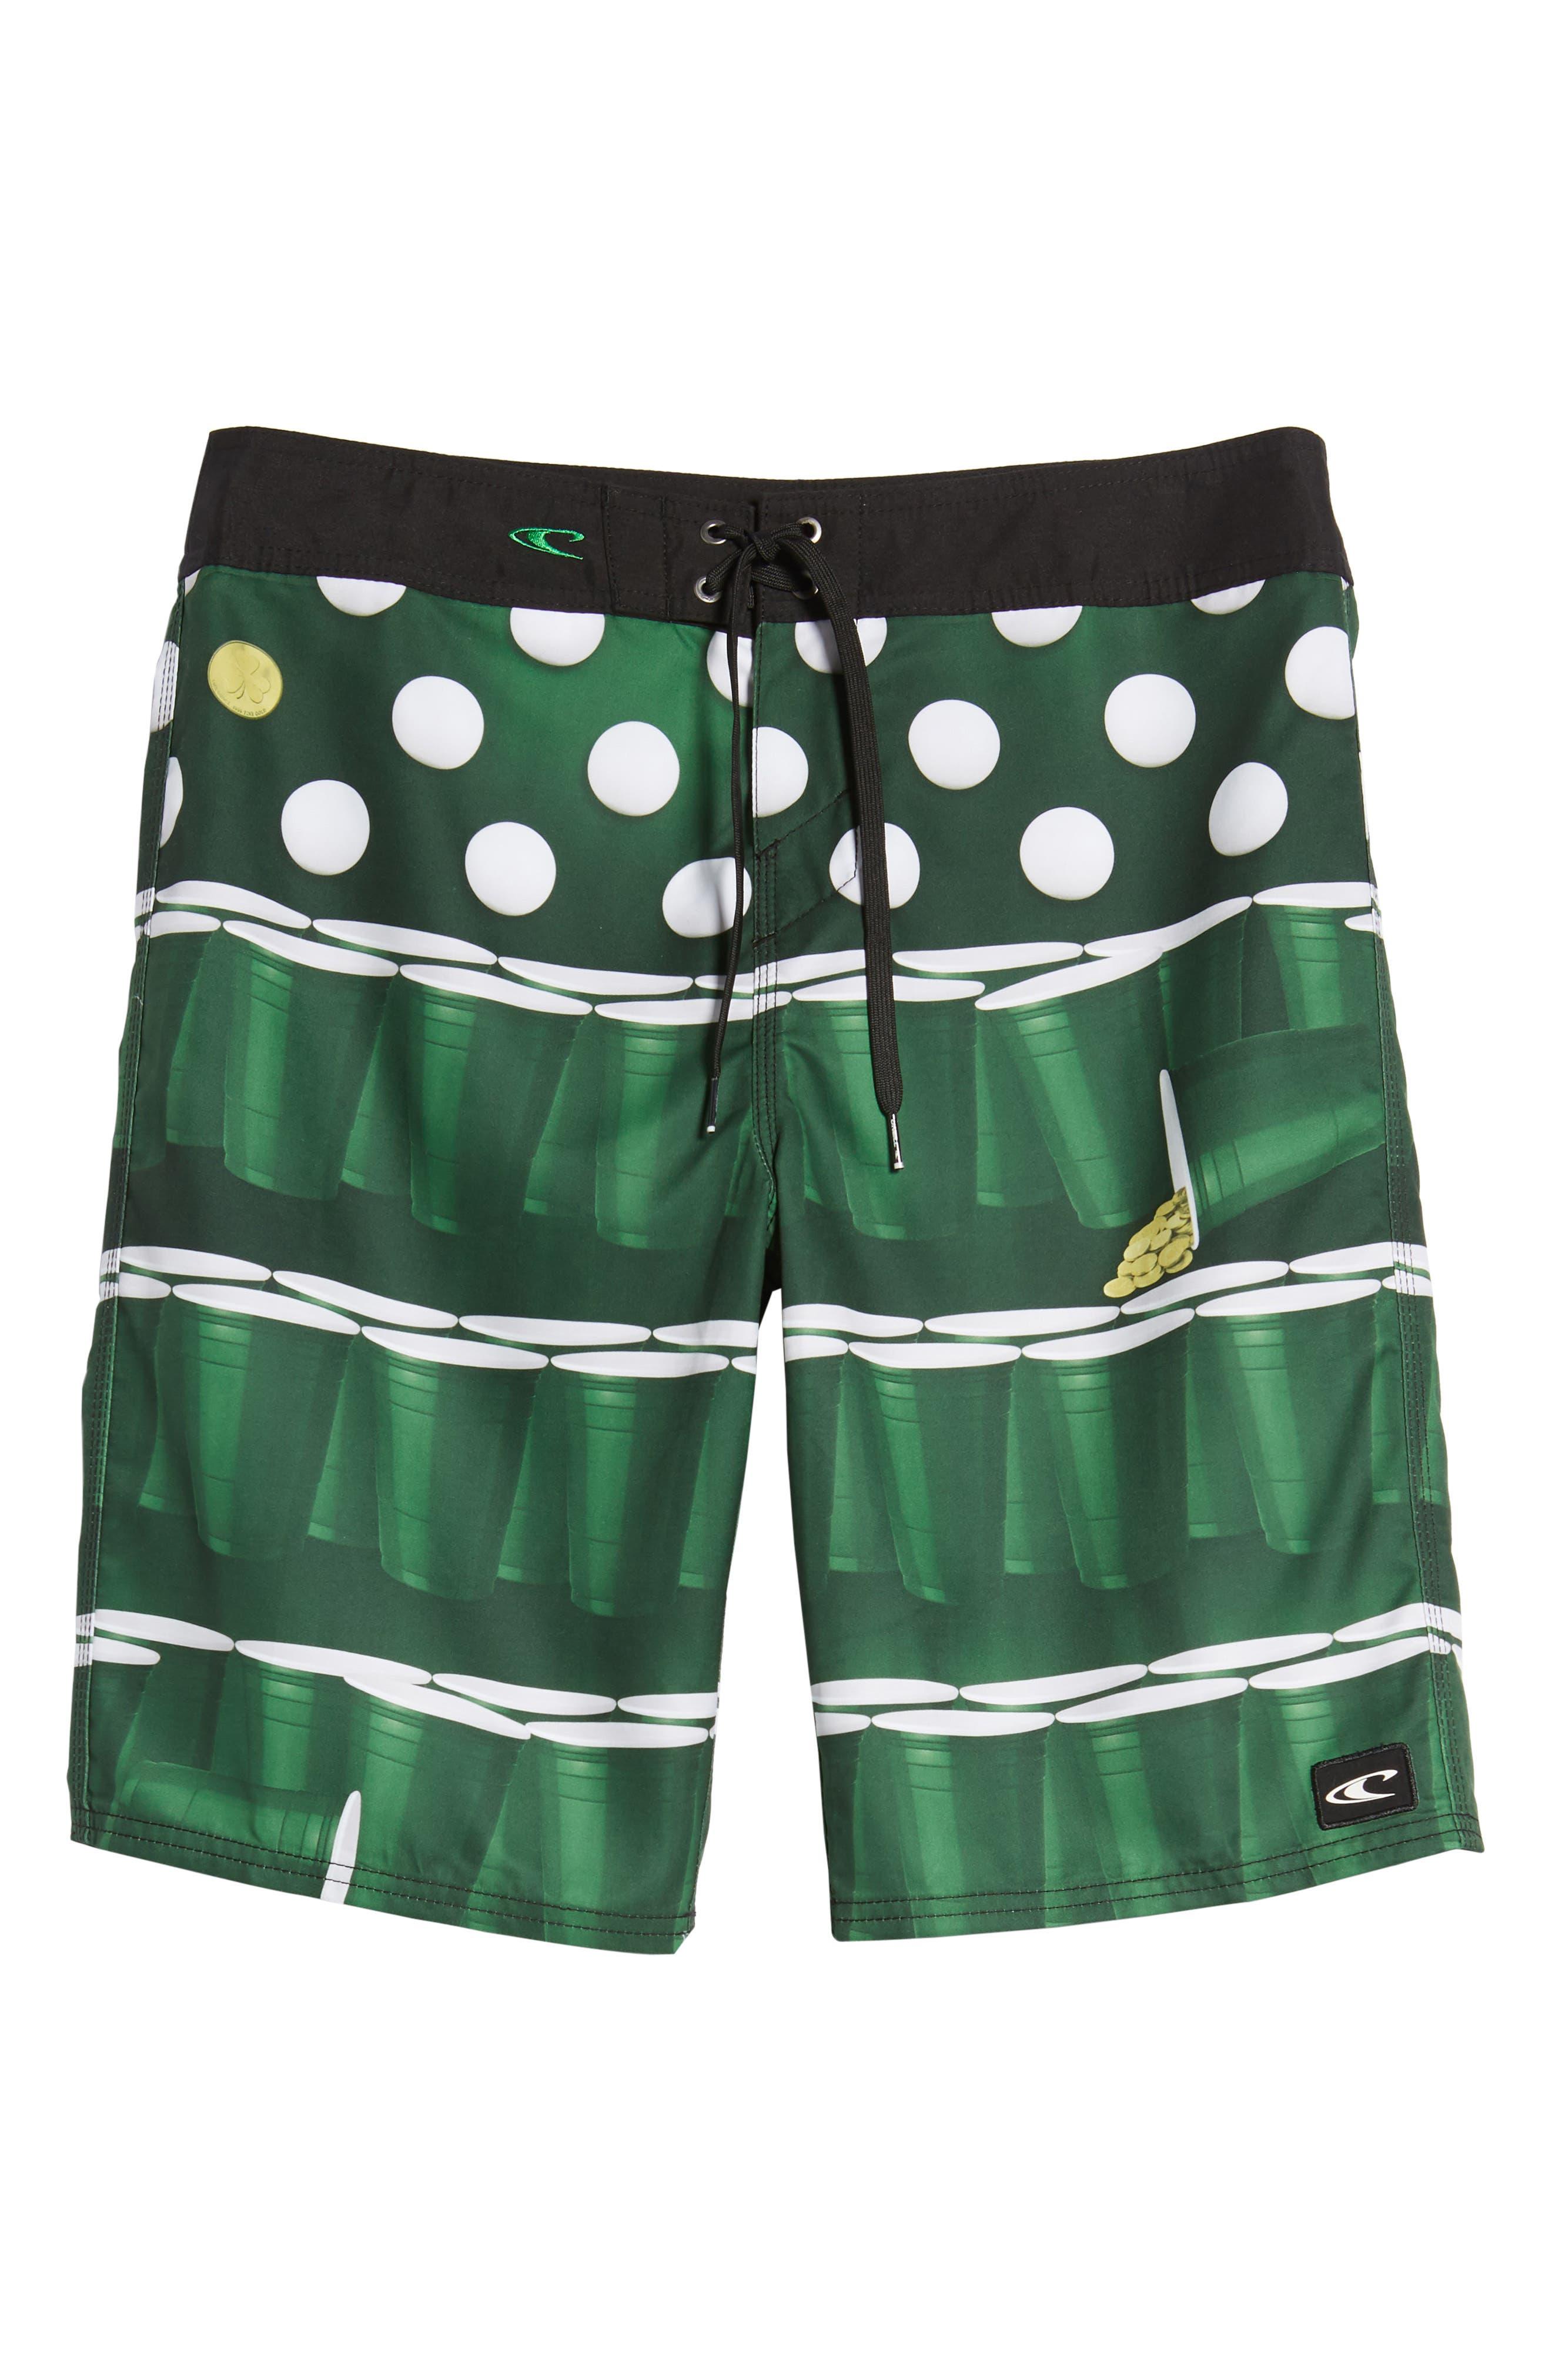 St. Paddy's Pong Board Shorts,                             Alternate thumbnail 6, color,                             300